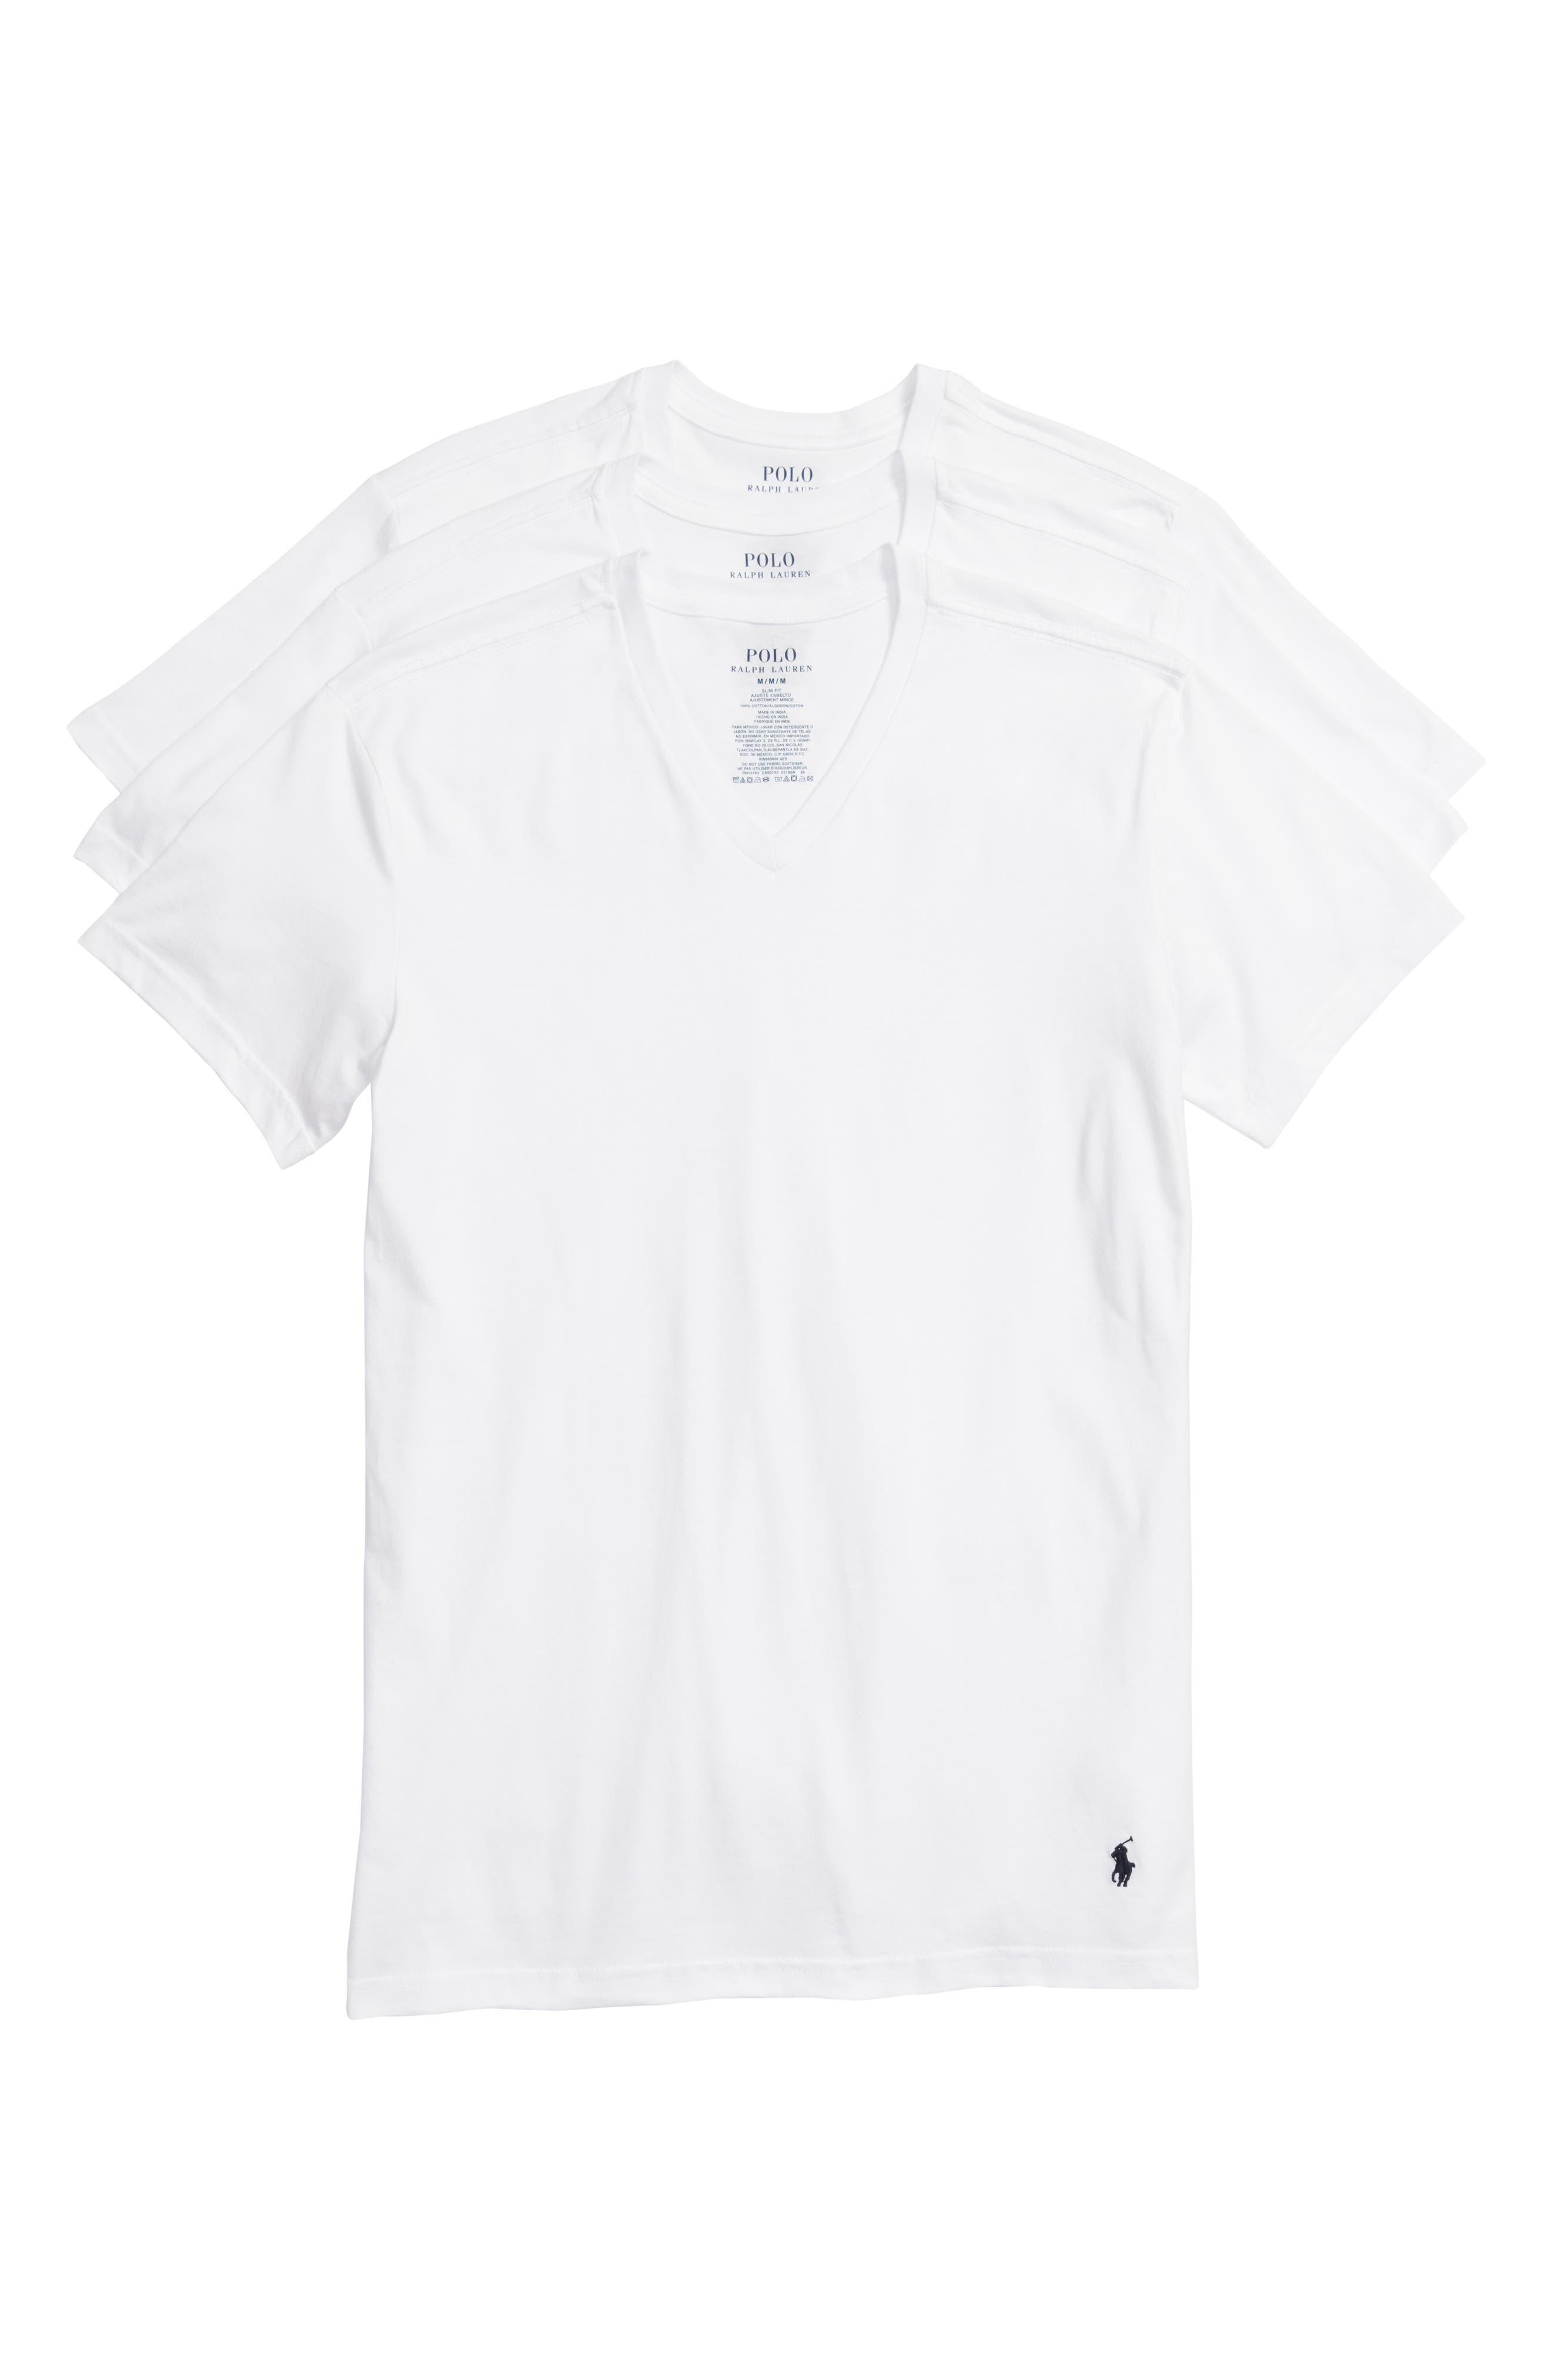 Polo Ralph Lauren 3-Pack Slim Fit V-Neck T-Shirts,                         Main,                         color, WHITE